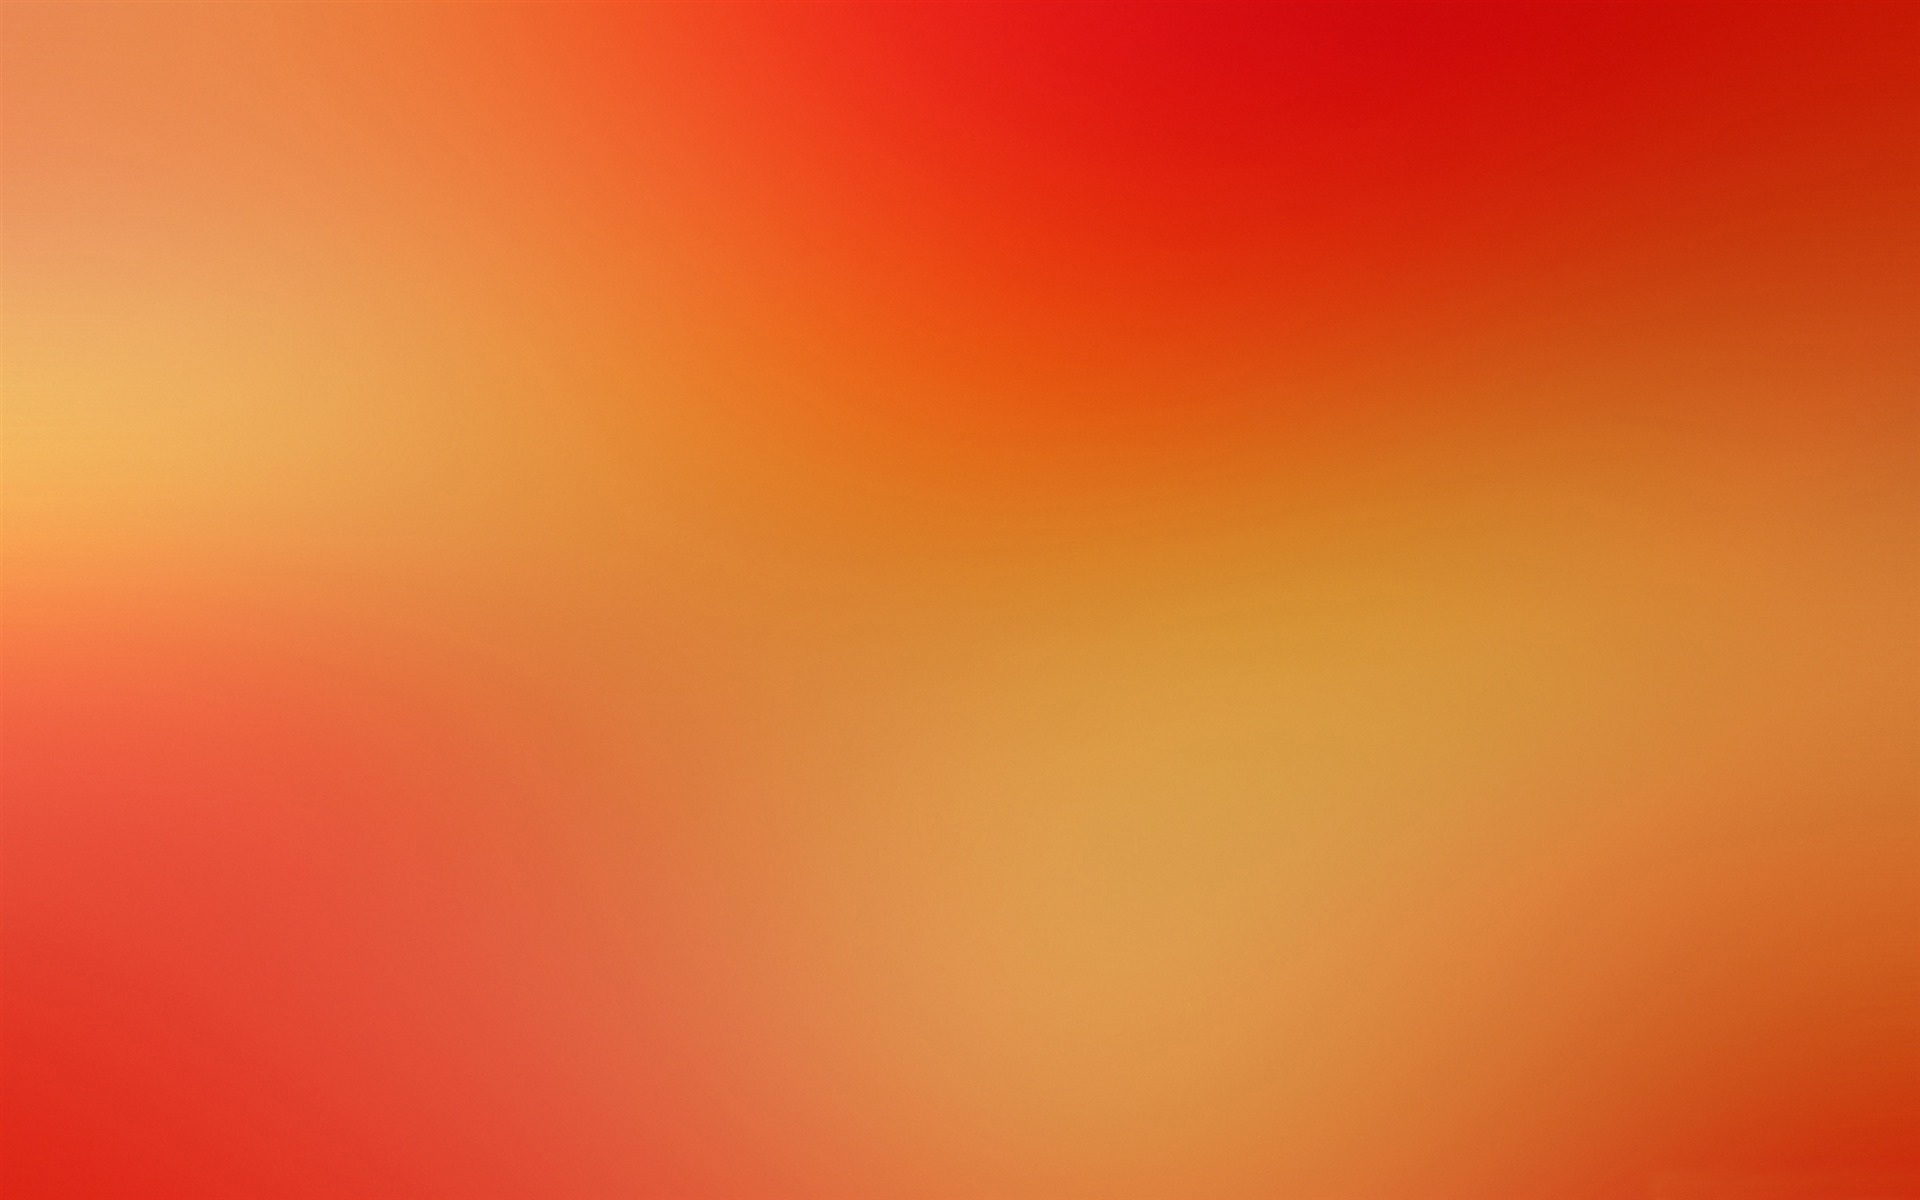 resumen de fondo naranja 2017 dise u00f1o hd wallpaper avance